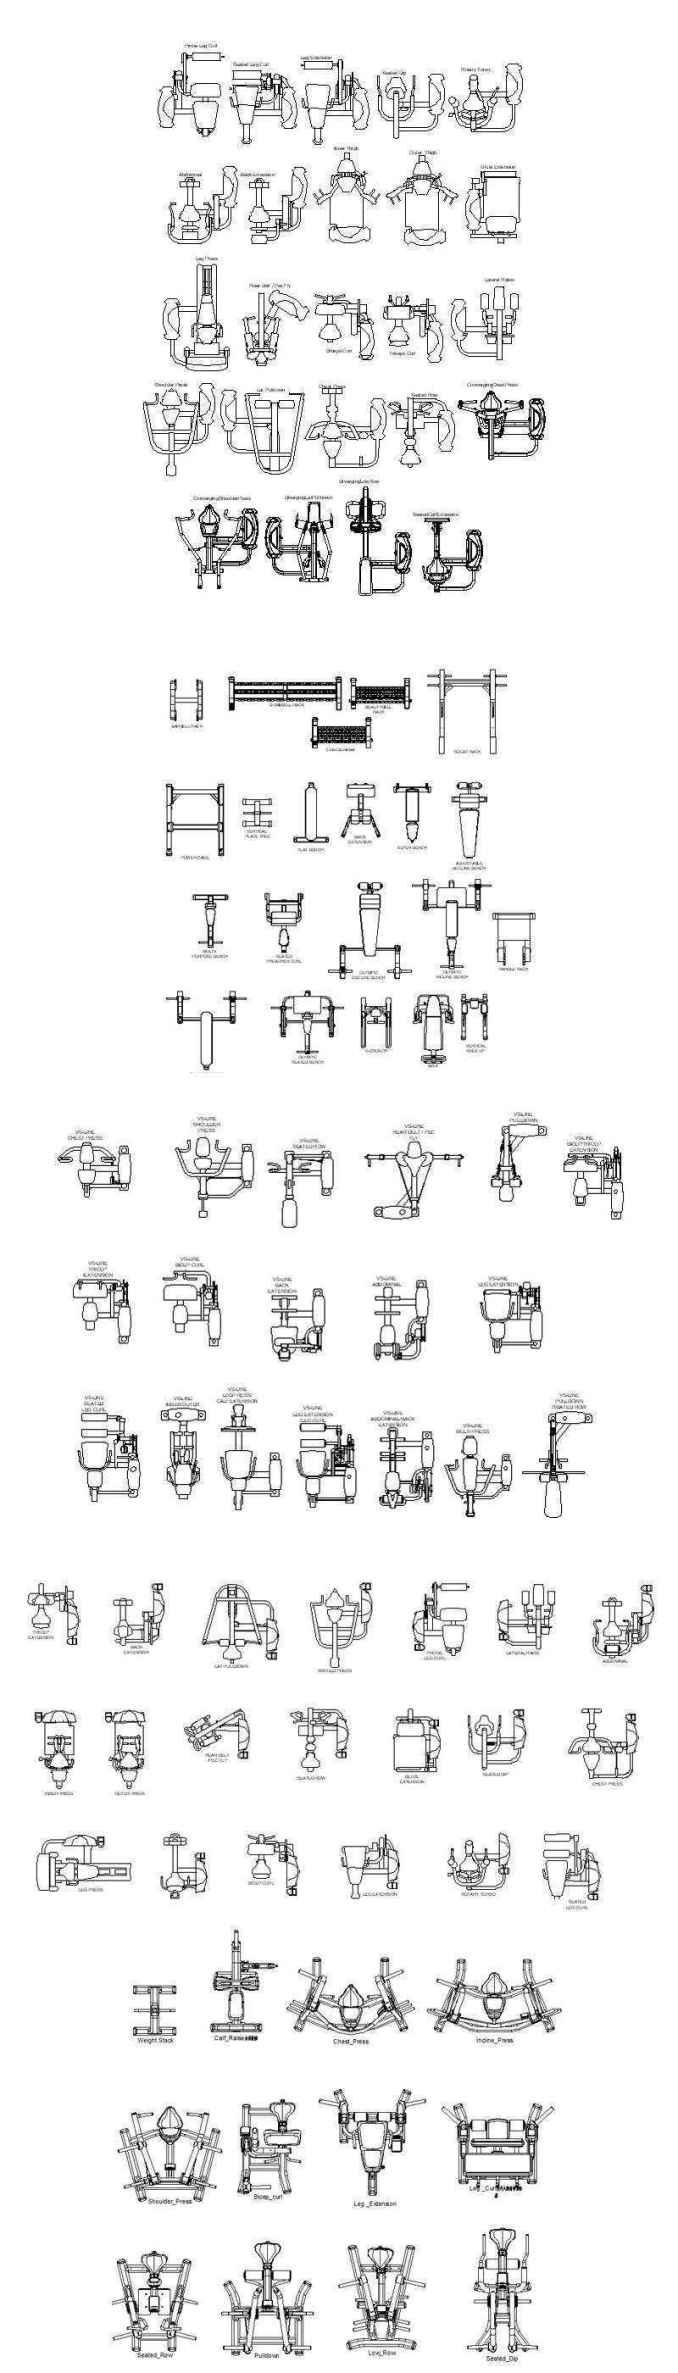 ★【Villa CAD Design,Details Project V.1-England Royal Style】Chateau,Manor,Mansion,Villa@Autocad Blocks,Drawings,CAD Details,Elevation